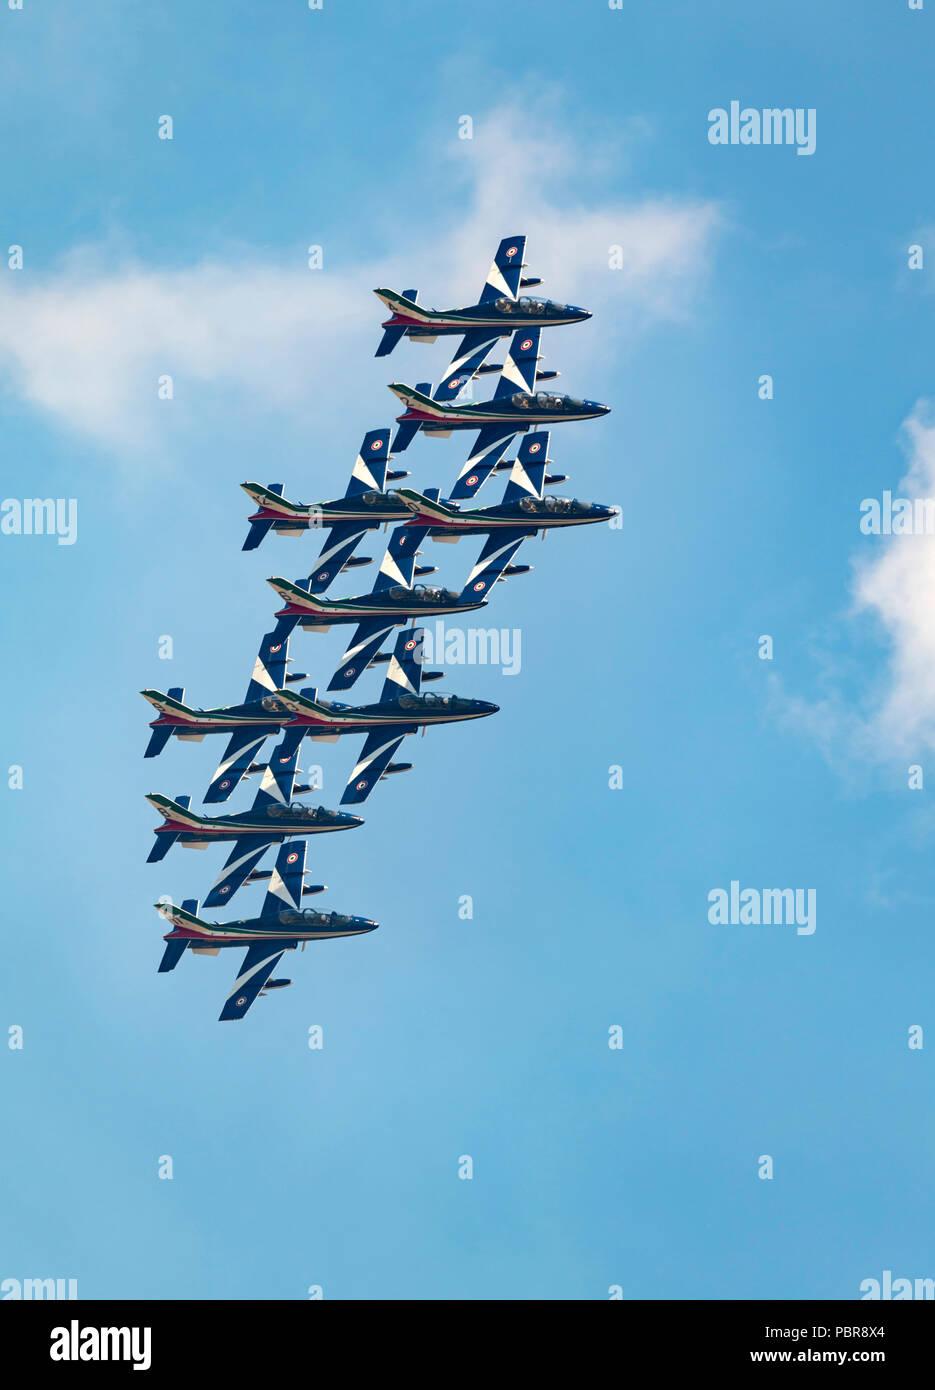 Frecce Tricolori, Italian Air Force, Aerobatic Team using AermacchiAT-339A aircraft Stock Photo